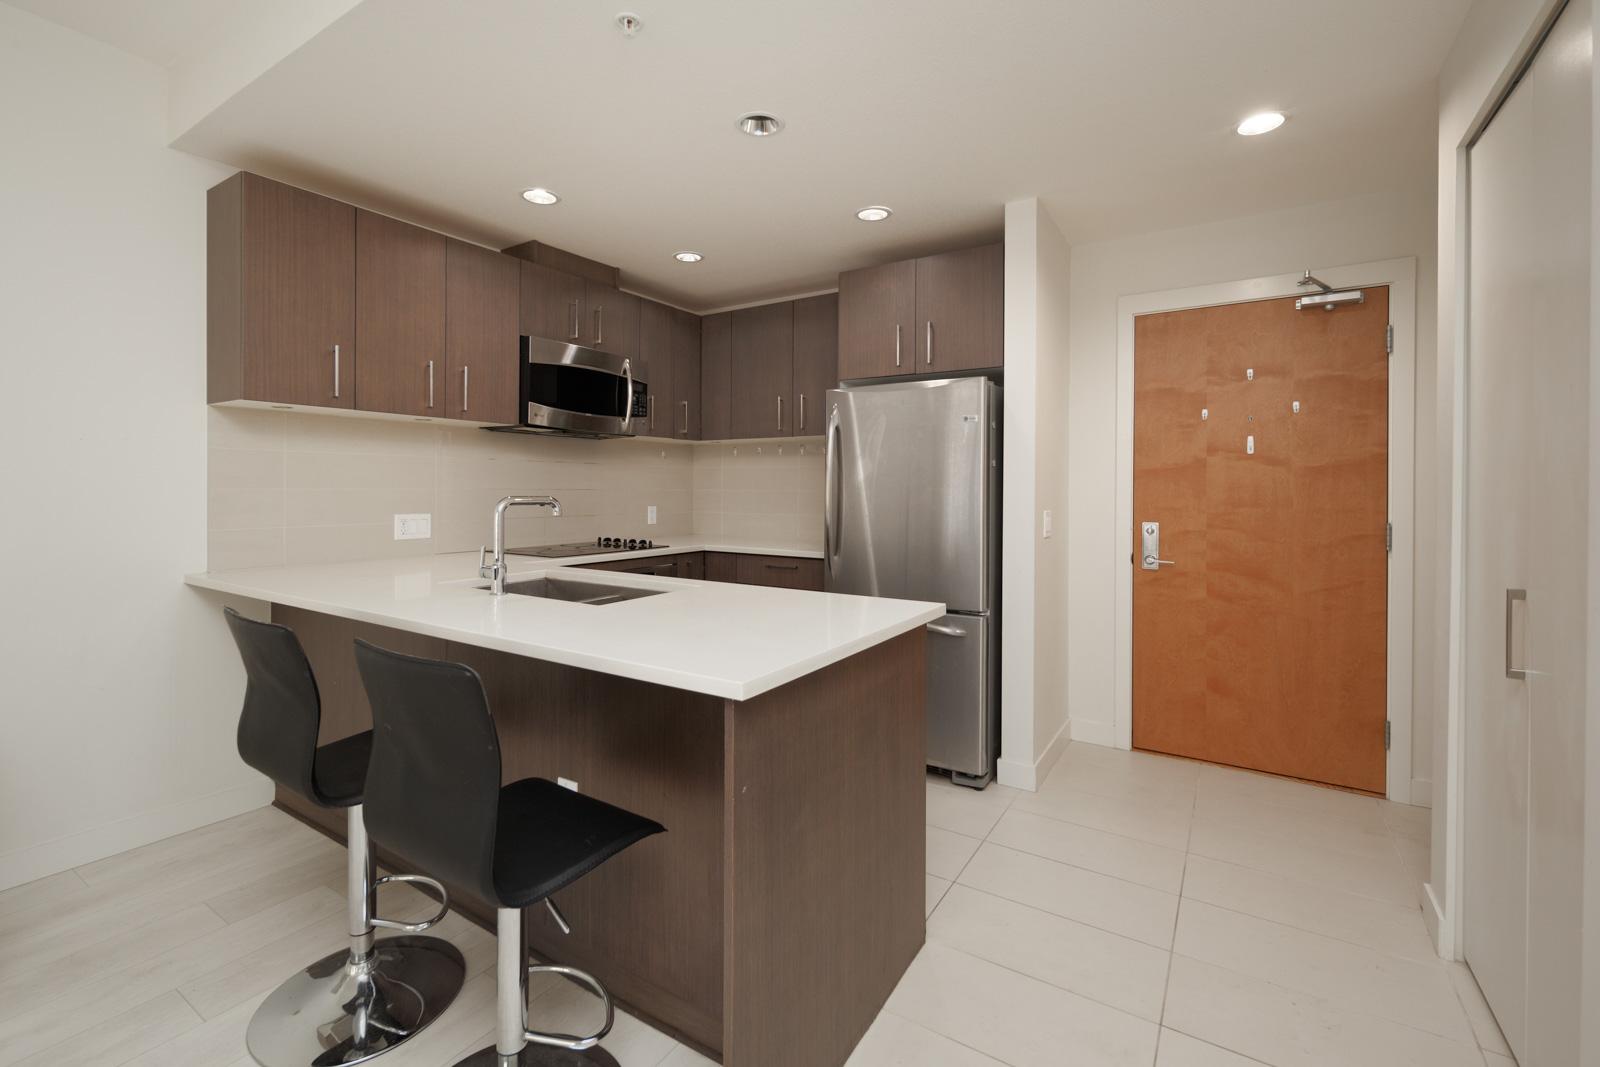 kitchen in rental condo with Birds Nest Properties property management in UBC